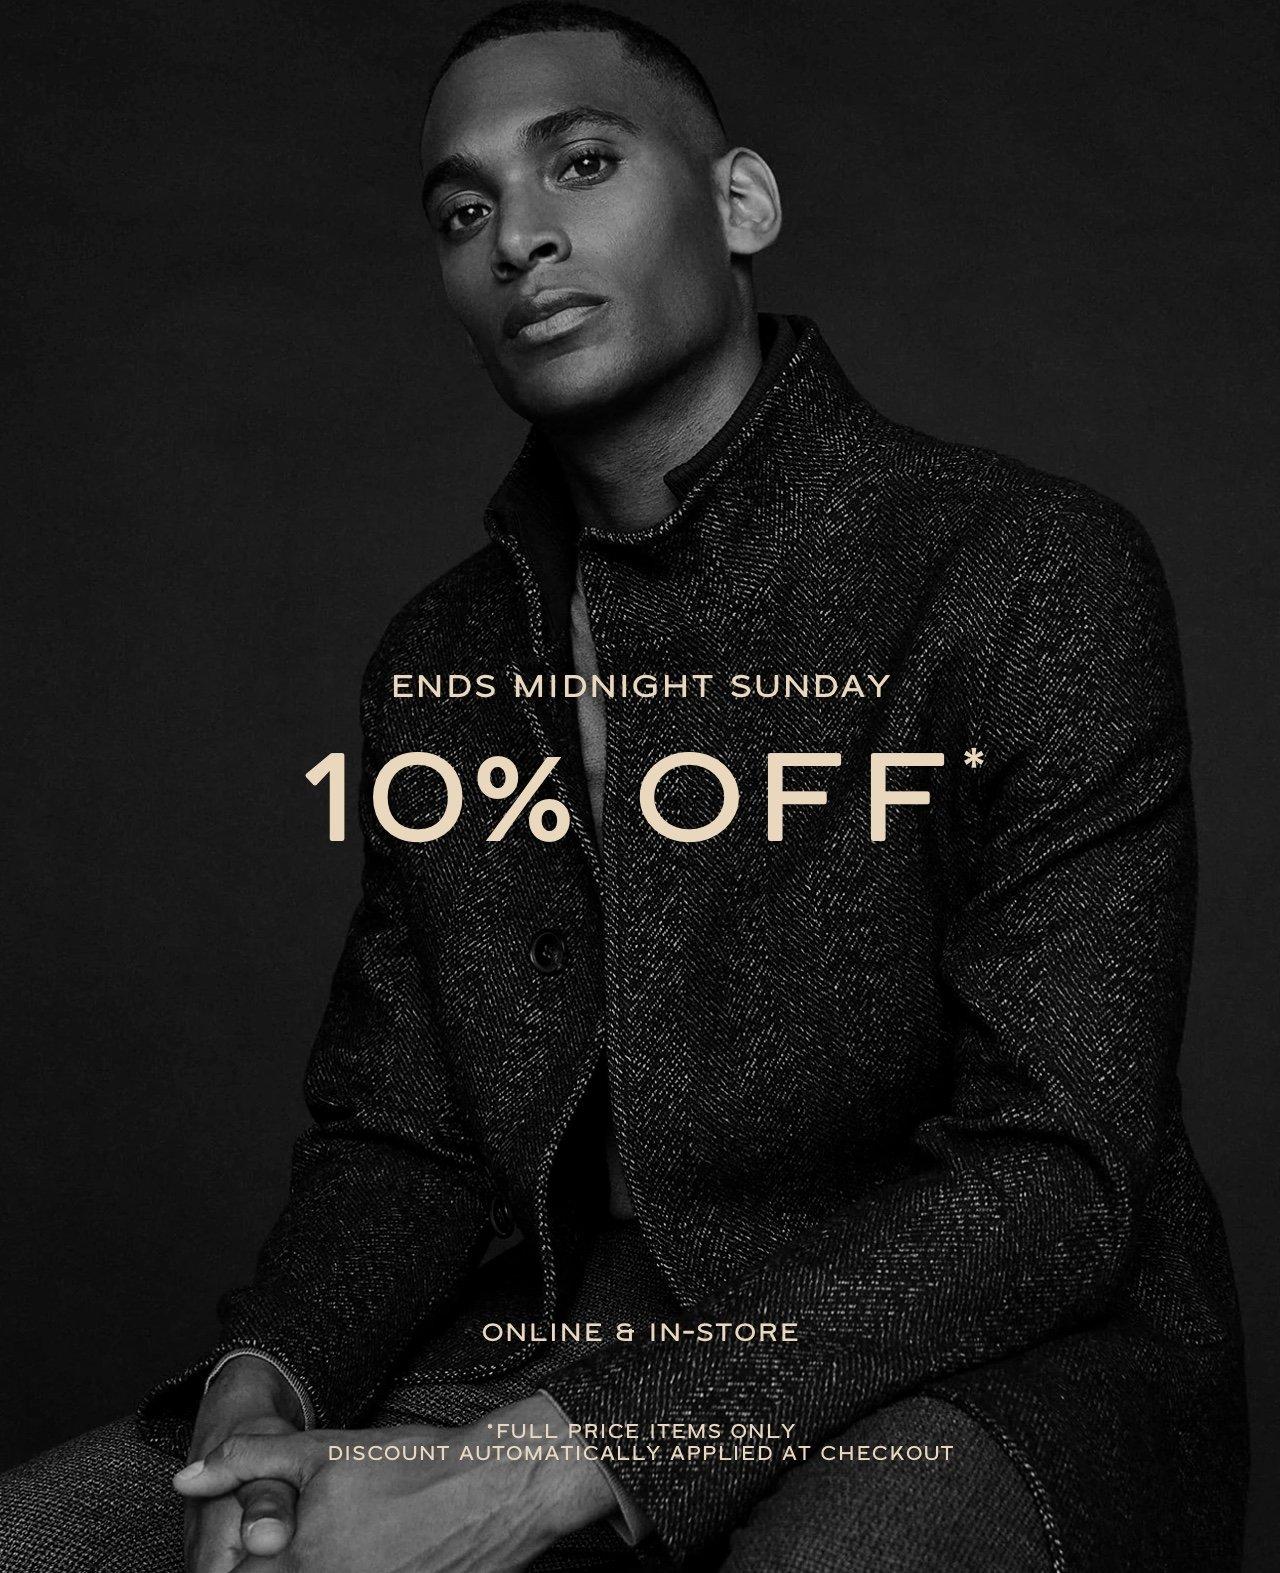 10% Off Ends Midnight Sunday